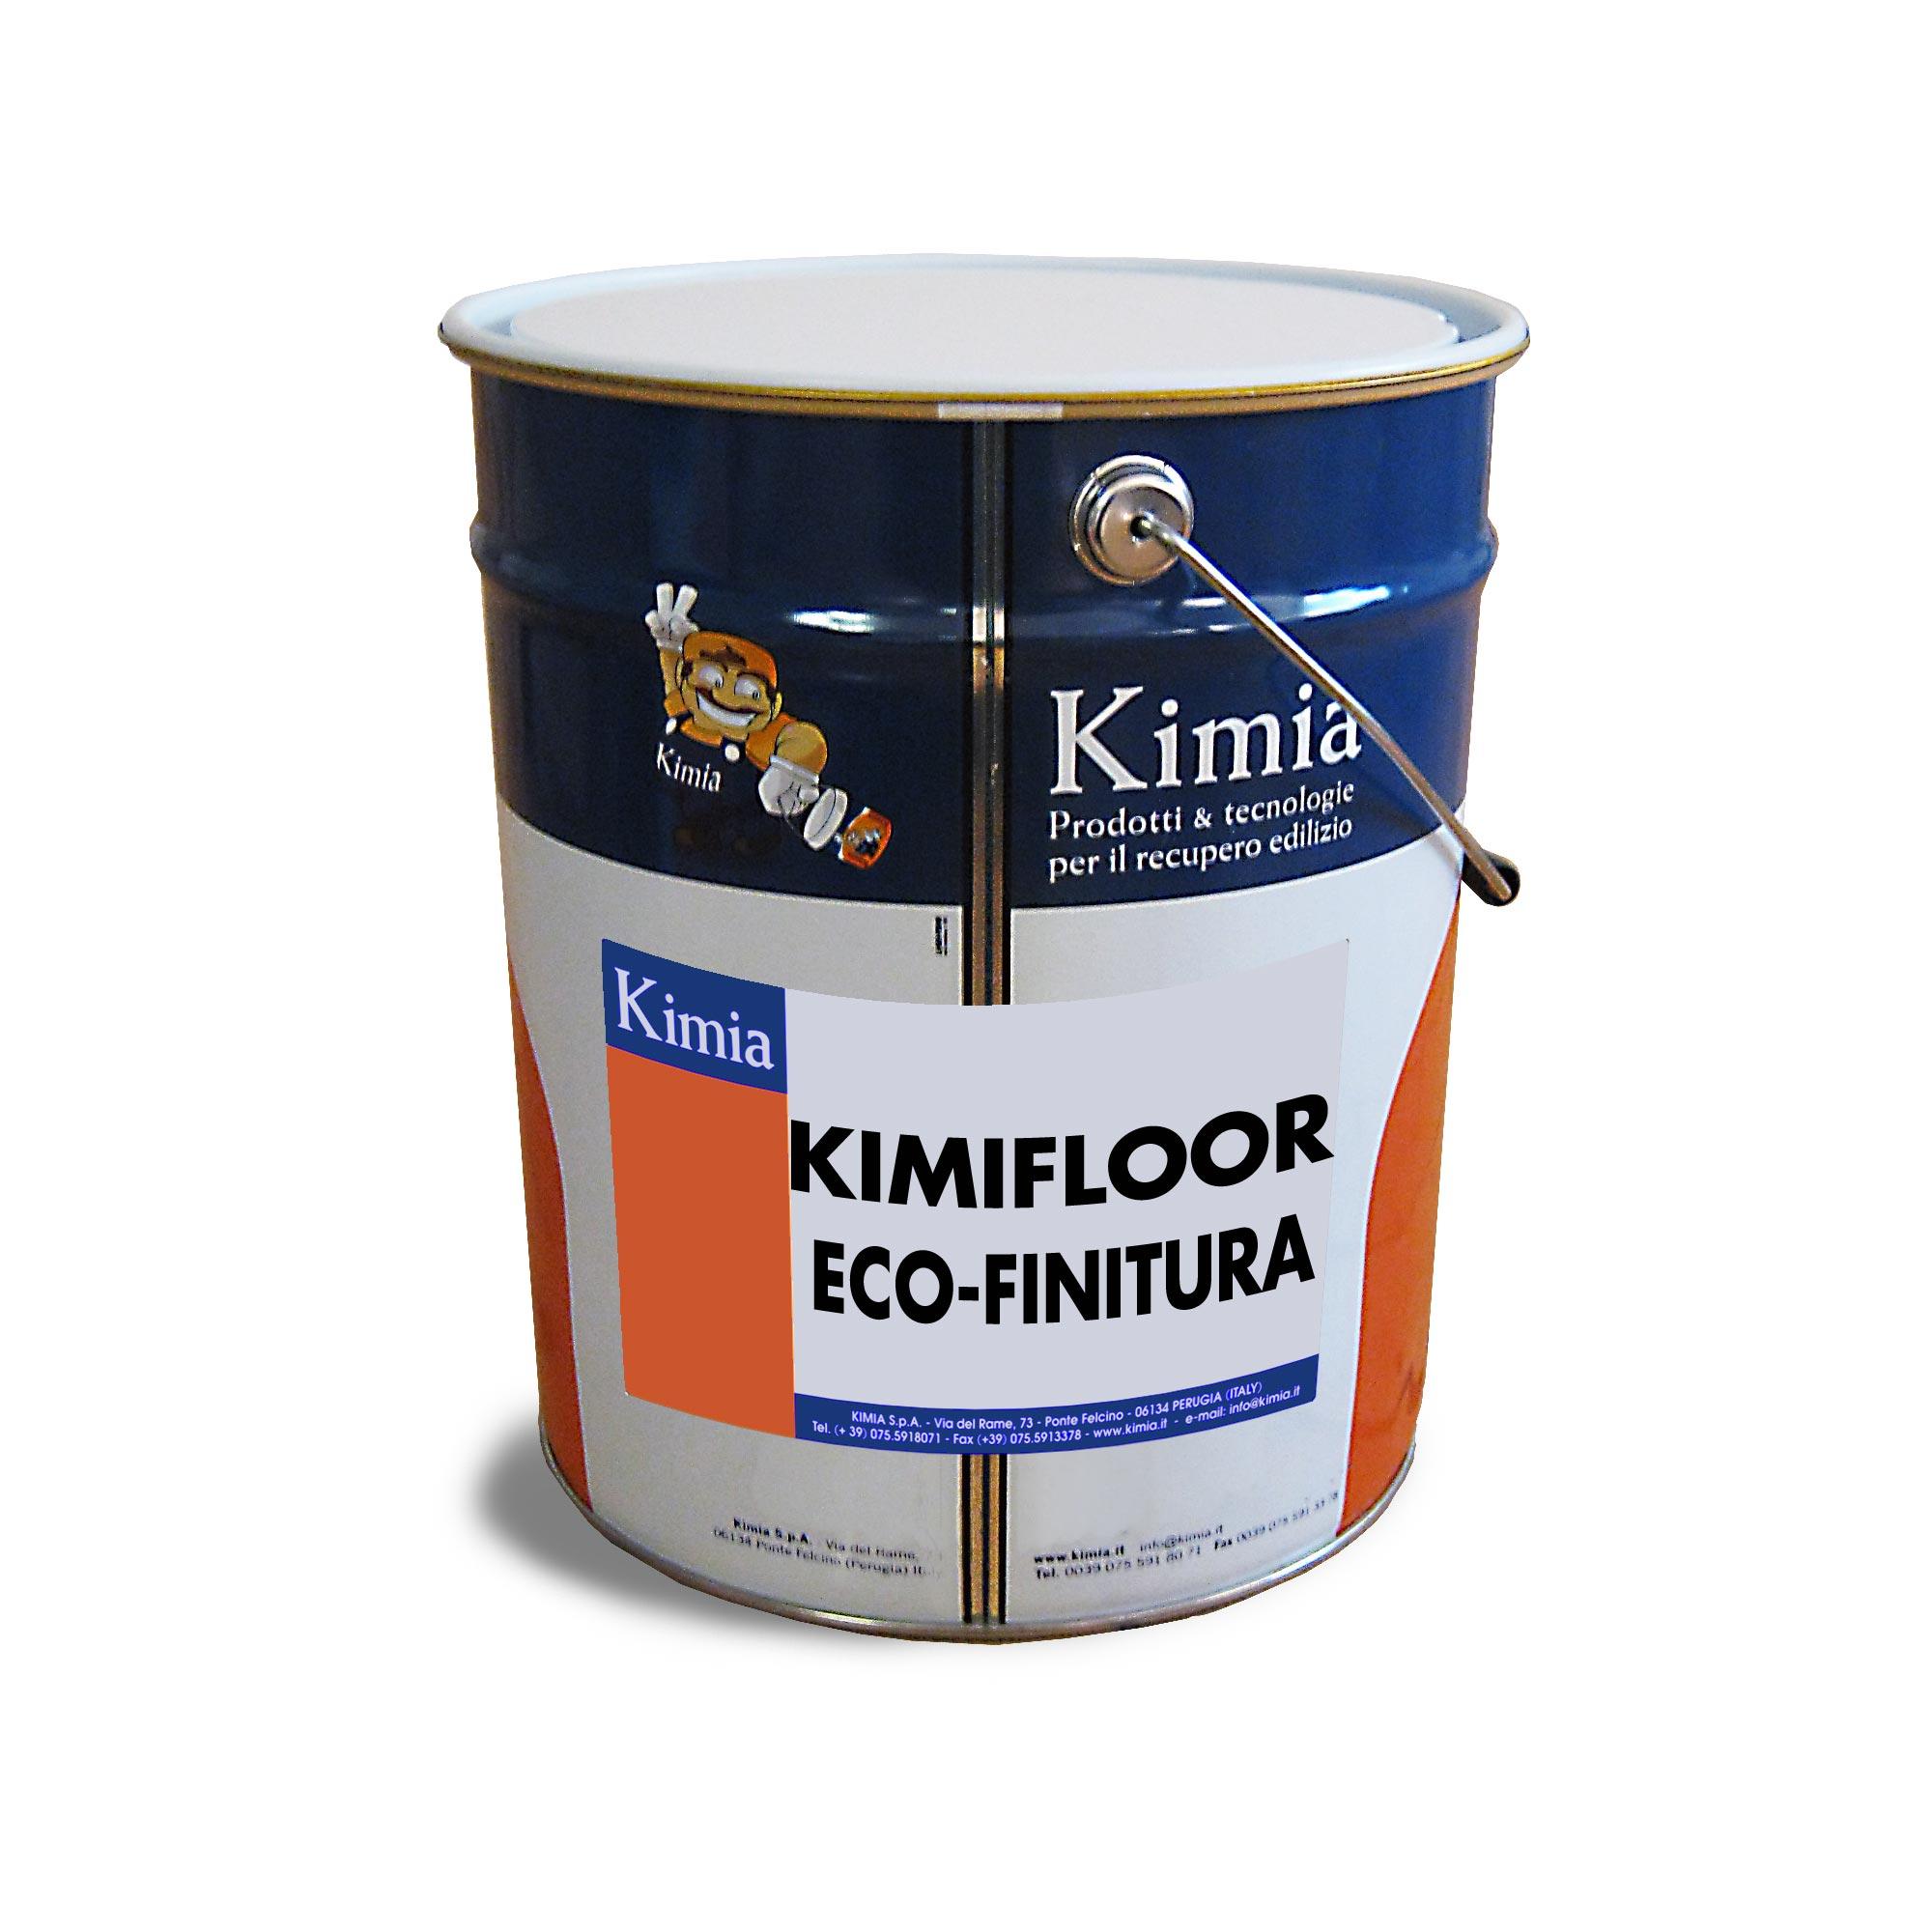 Kimifloor ECO-FINITURA